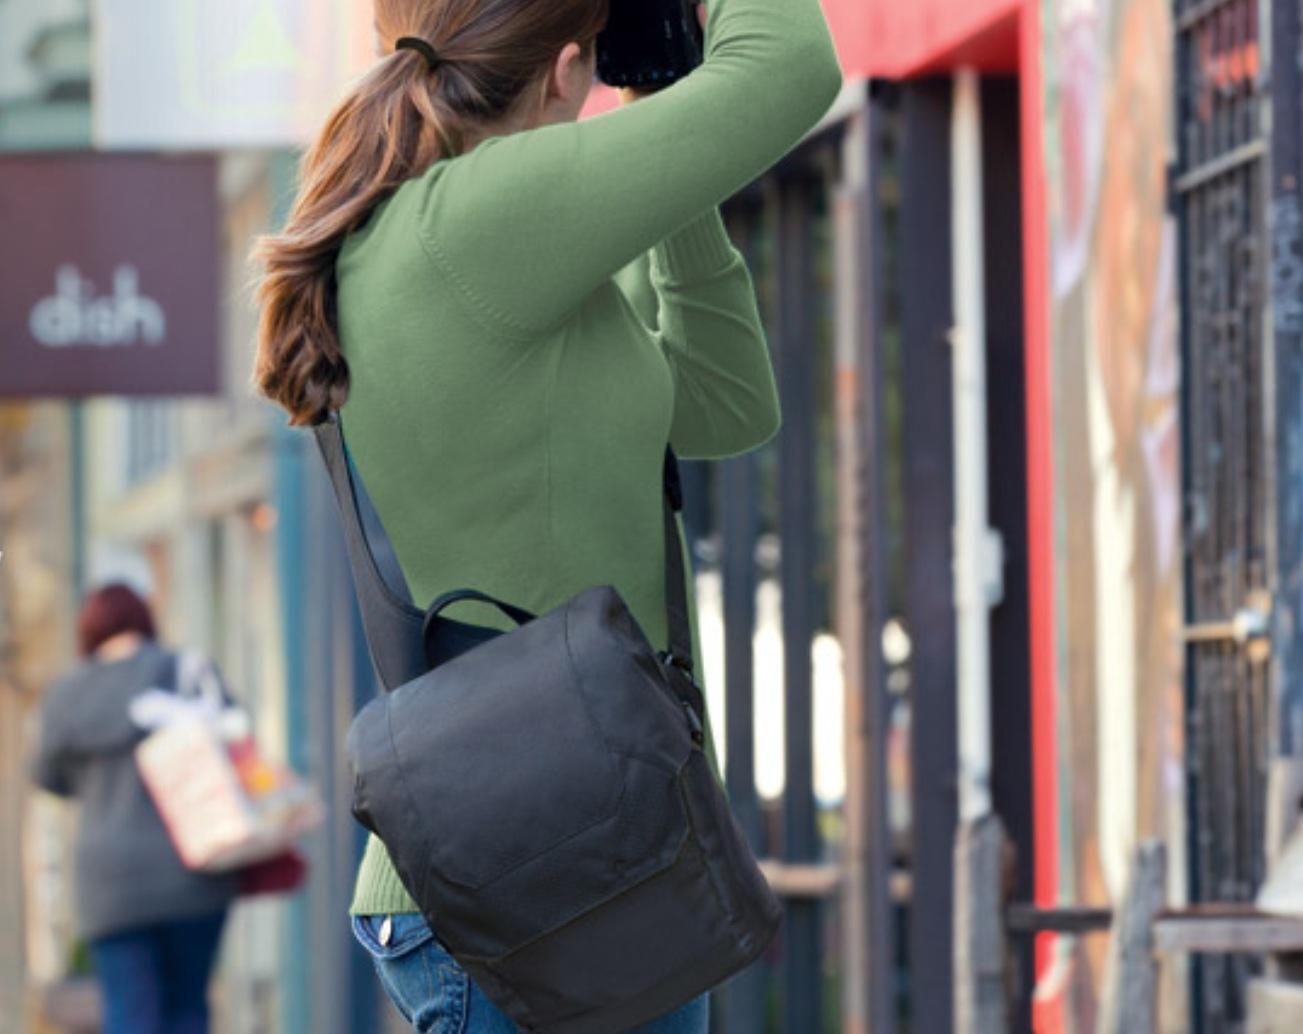 Photography Gear Outdoor Gear Gear Bags Cameras